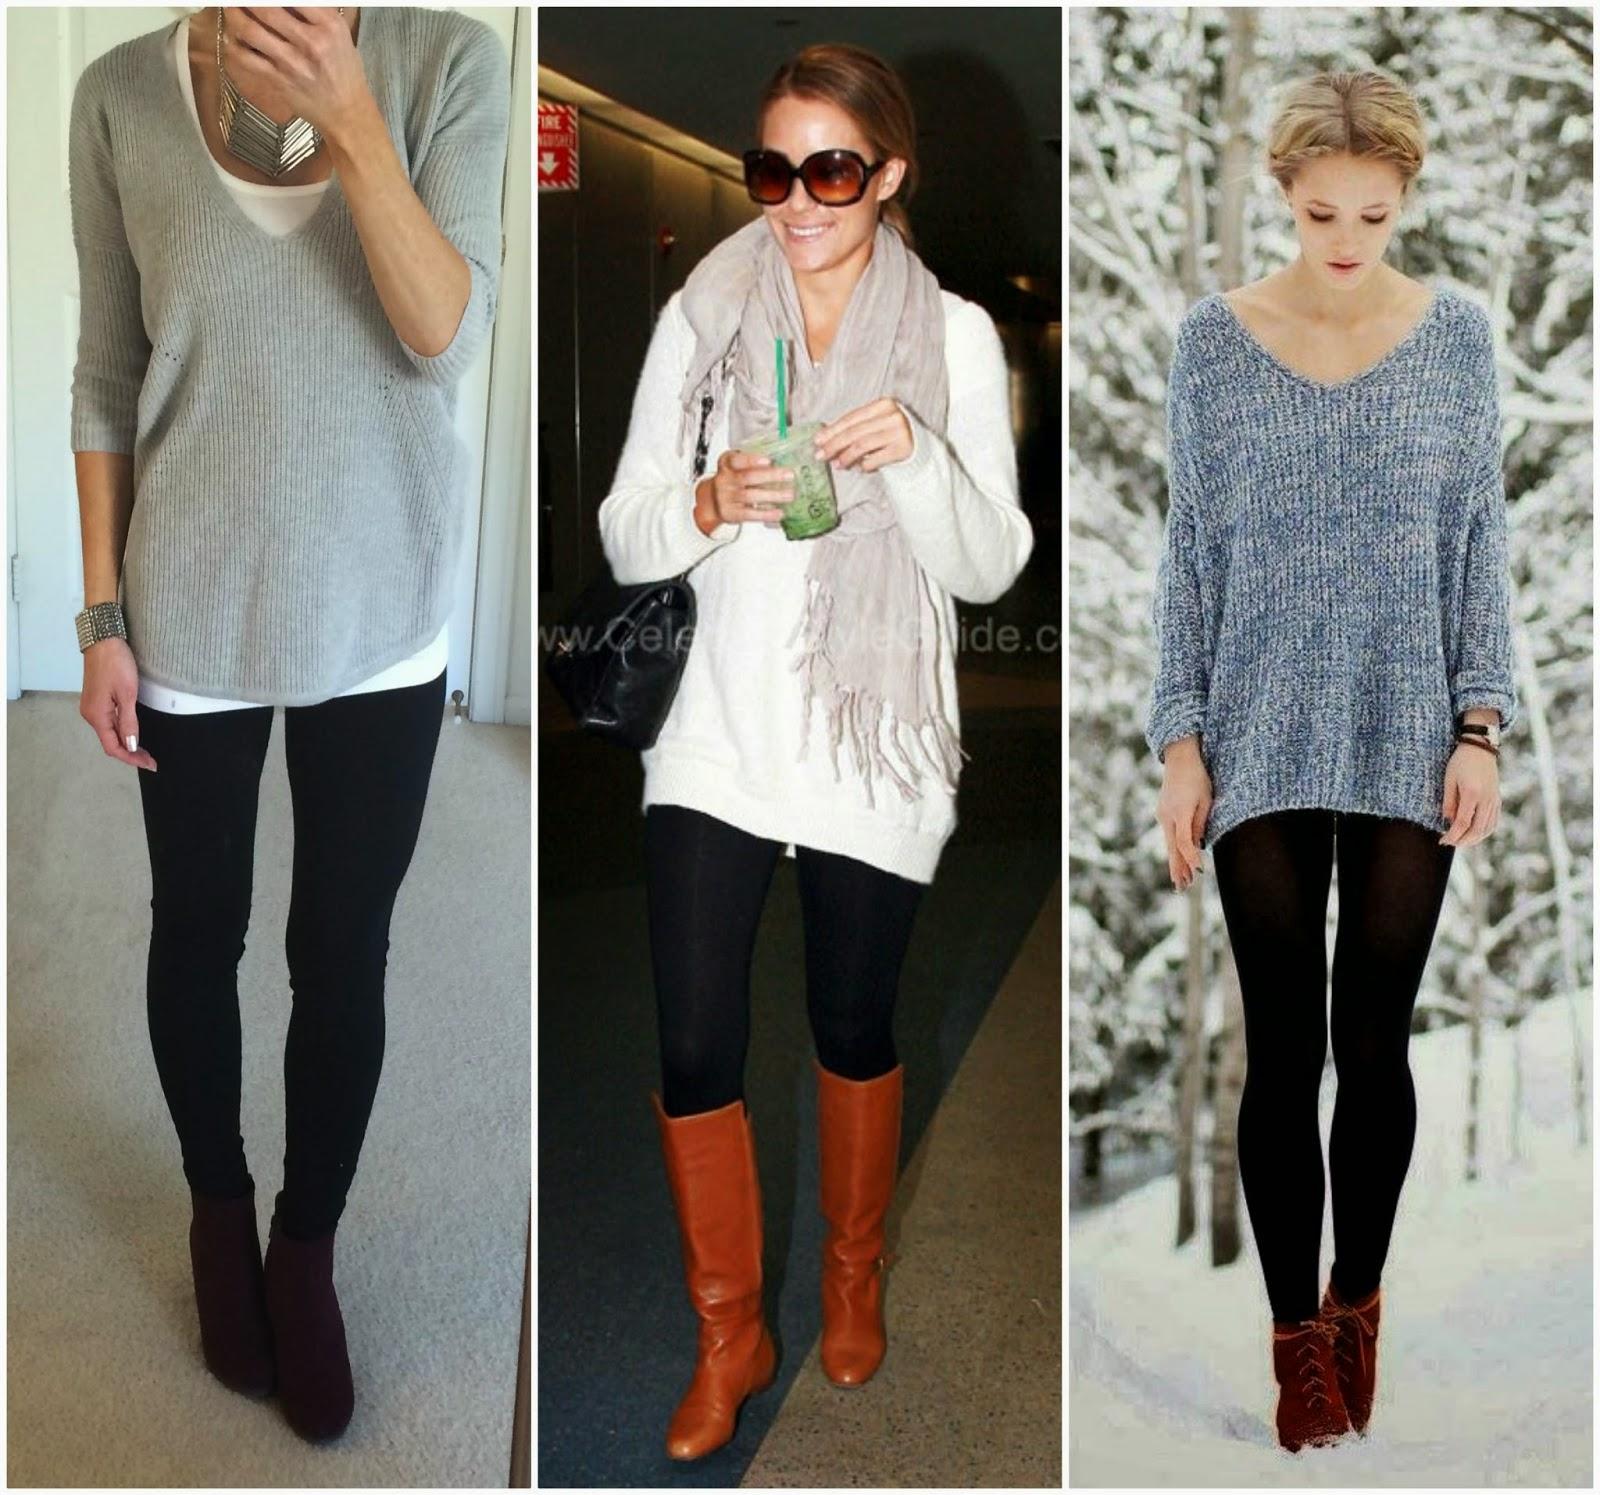 Long Sweater Dress with Leggings